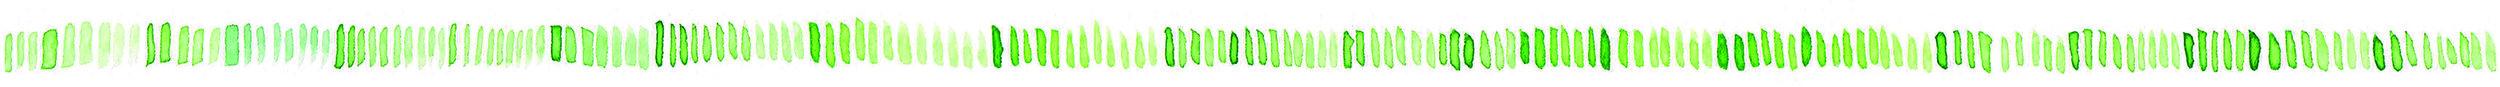 Aquarell-Graspapierbecher-Linie.jpg